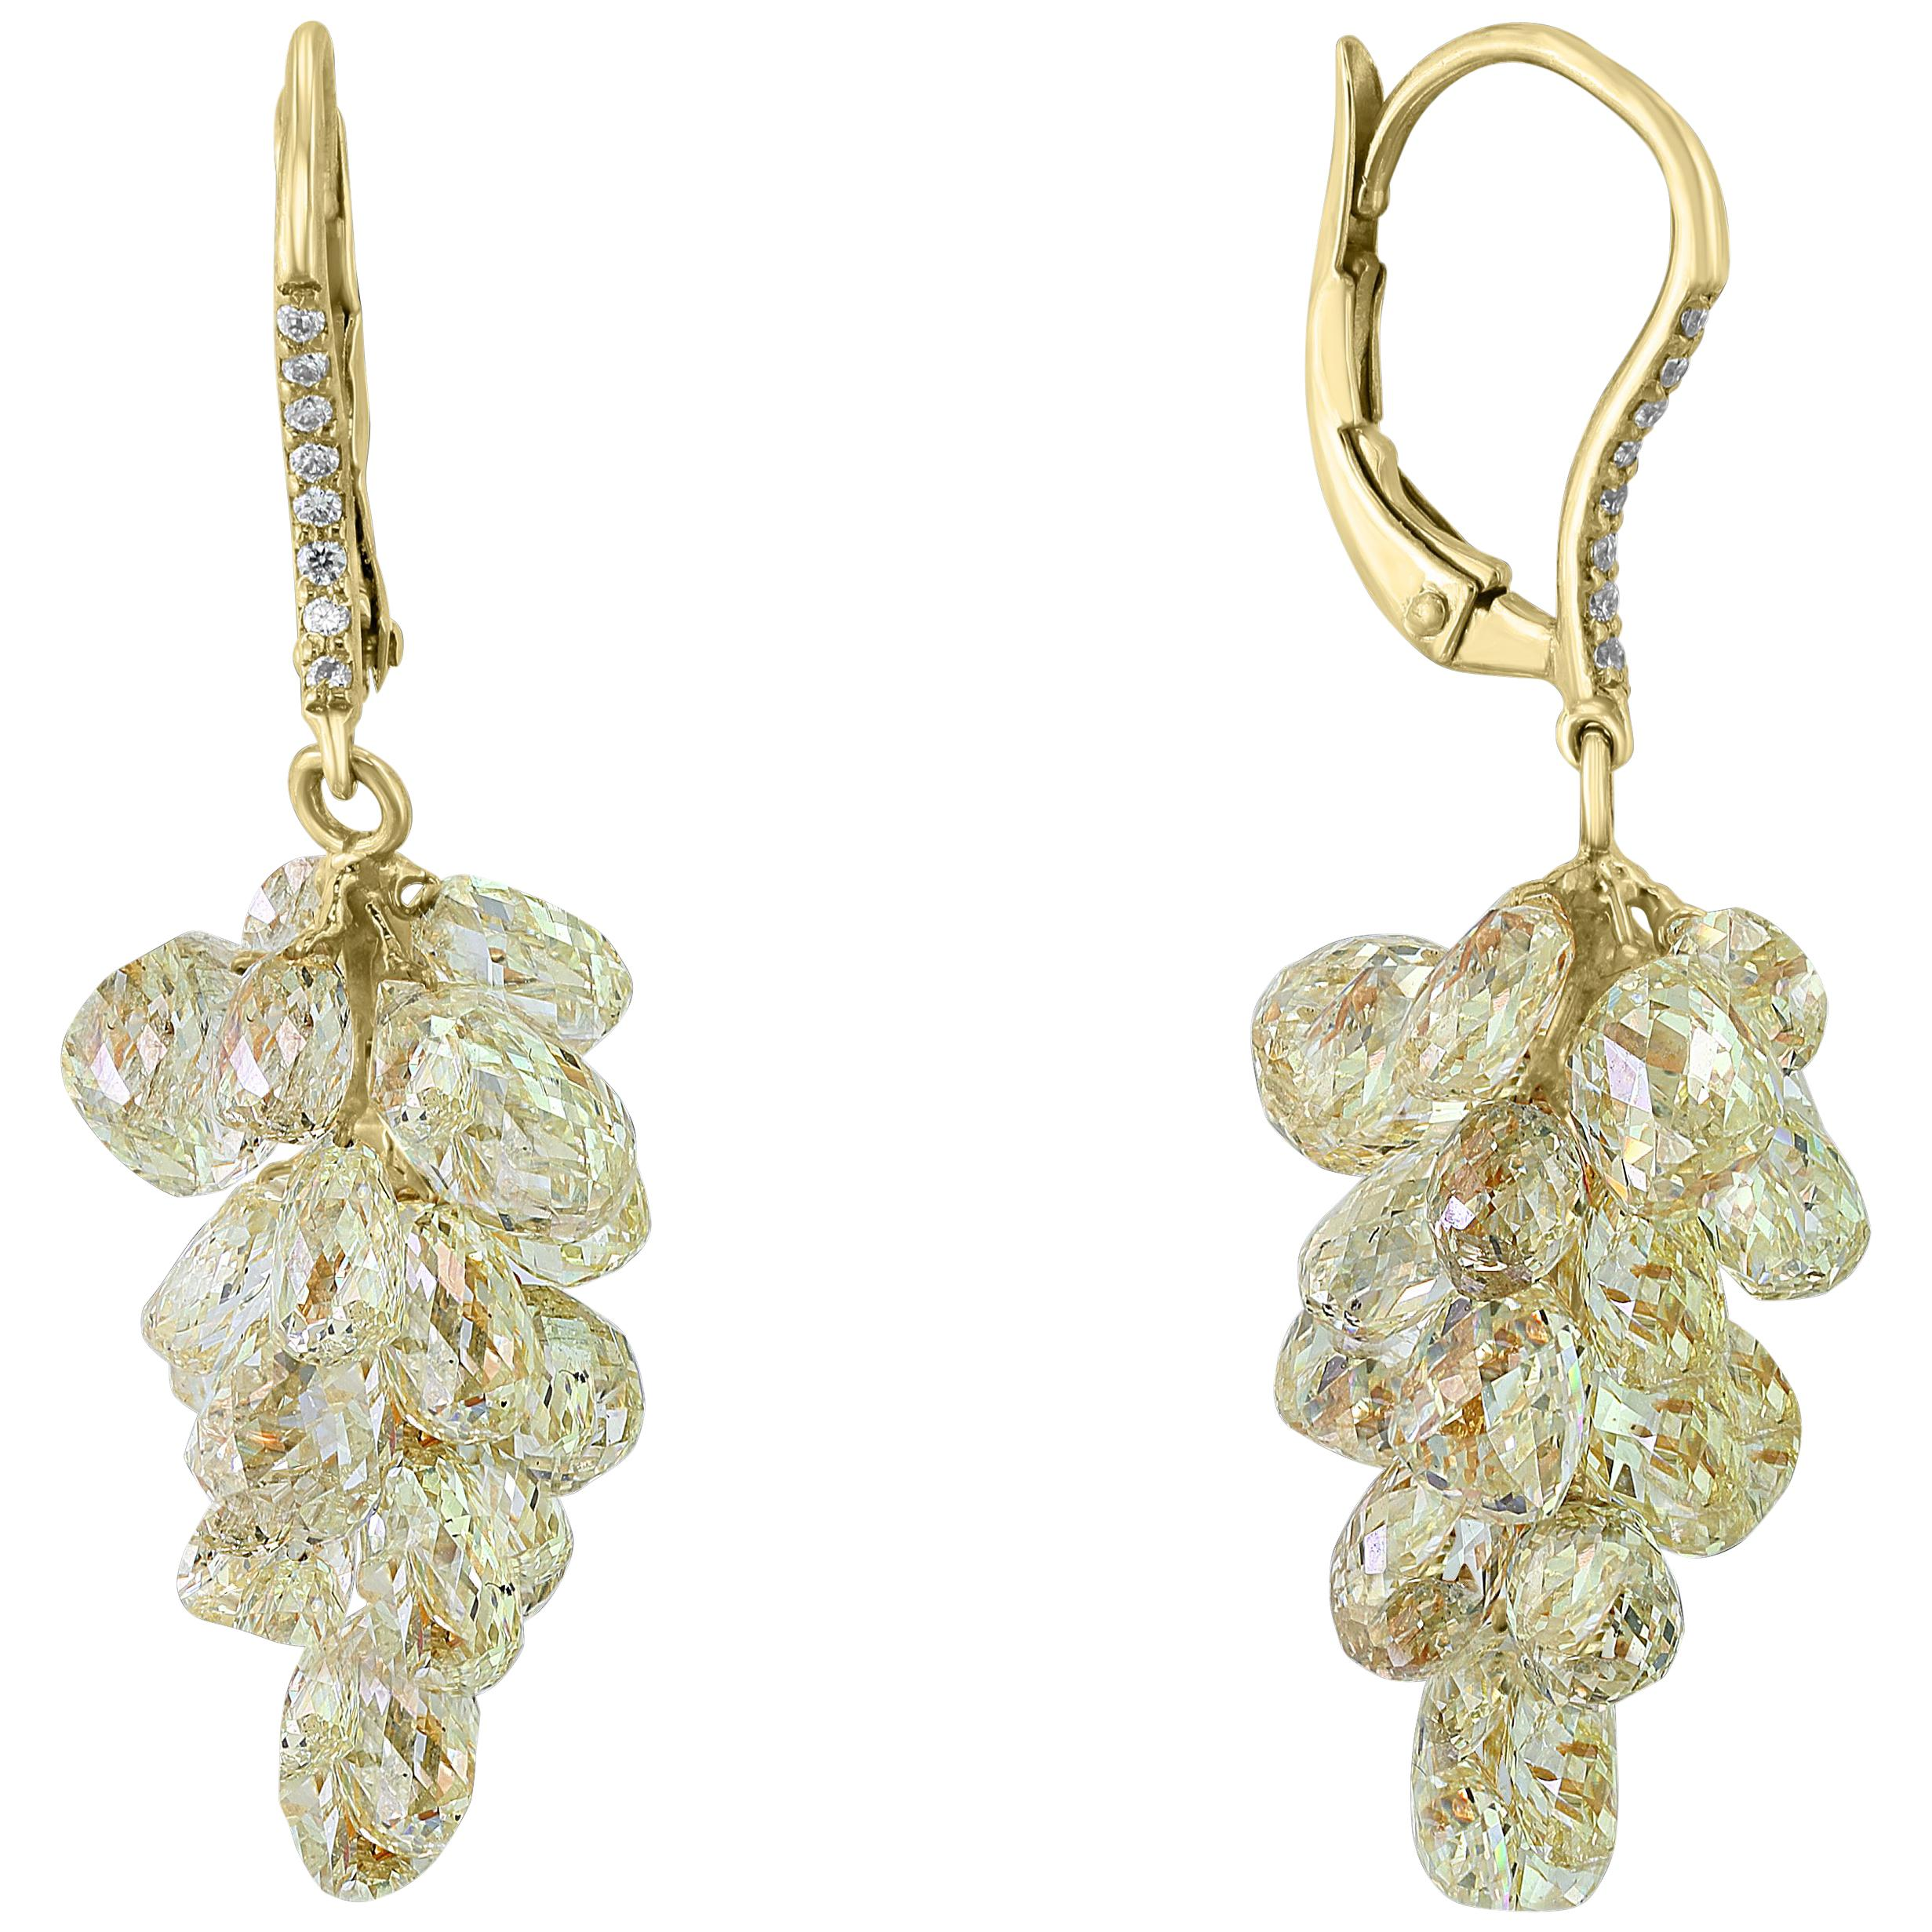 27 Carat Diamond Briolettes Hanging Drop Earrings 18 Karat Yellow Gold